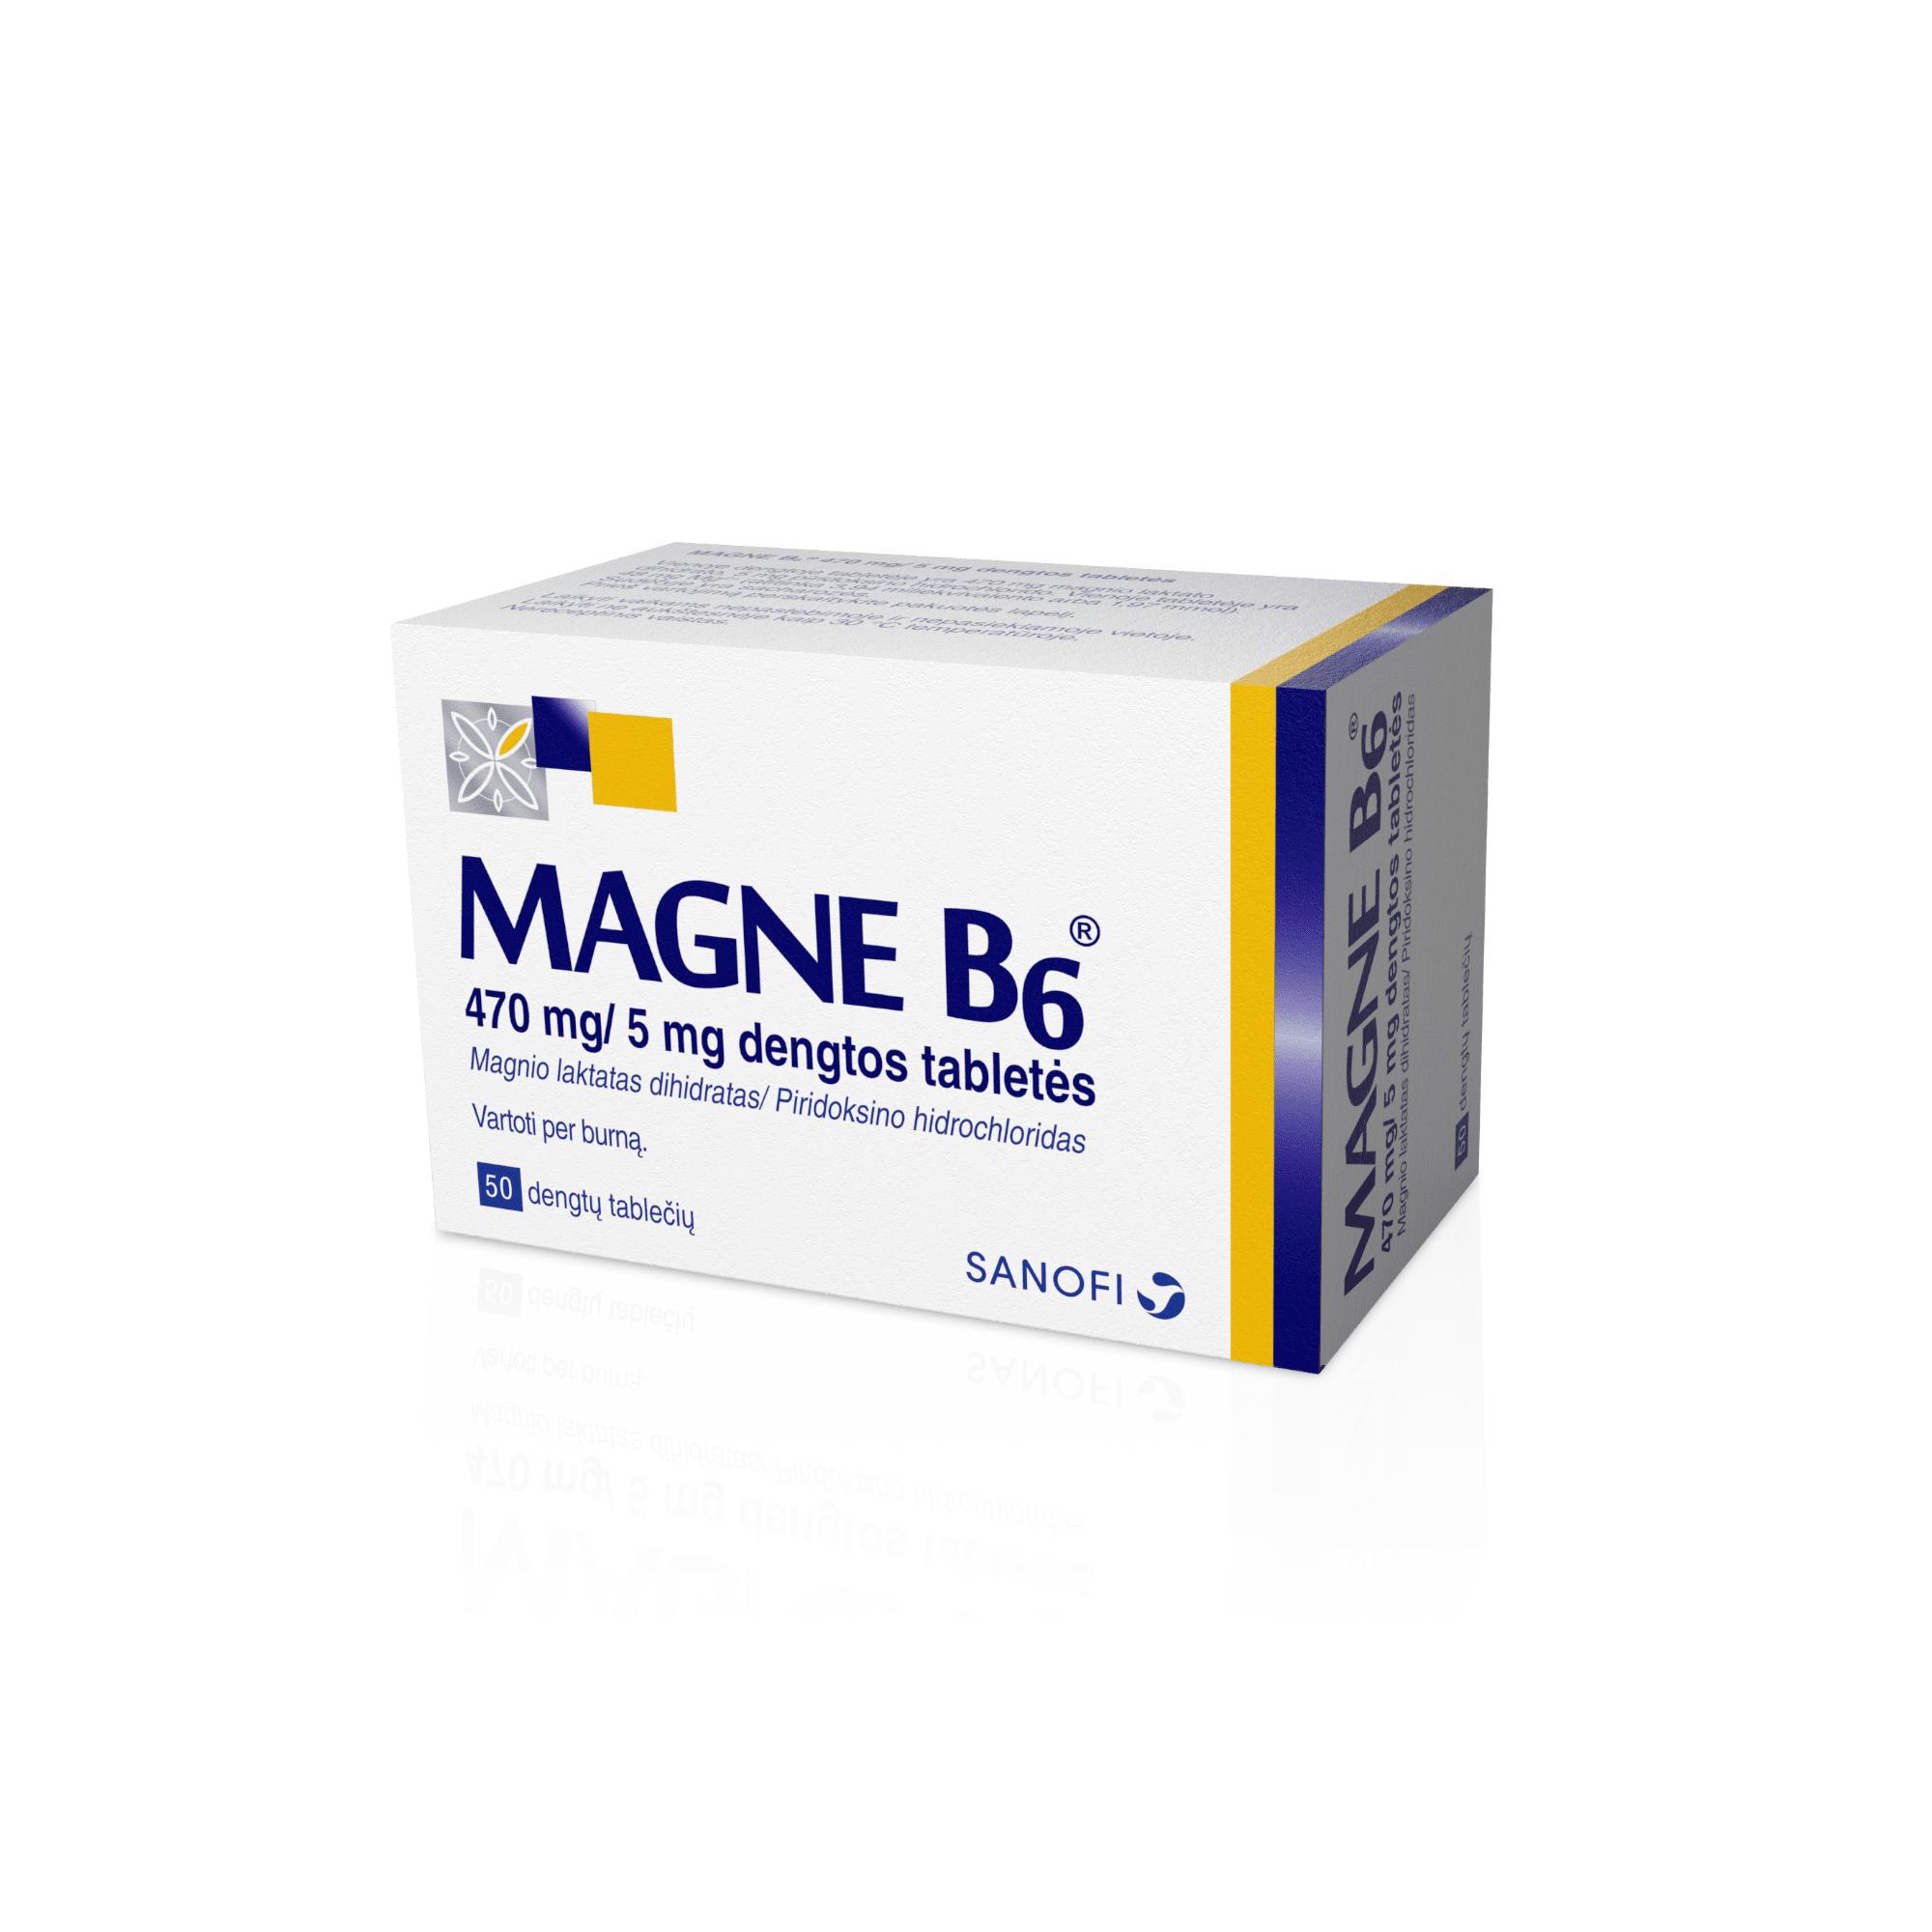 magne b6 nuo hipertenzijos gimnastika hipertenzijai video